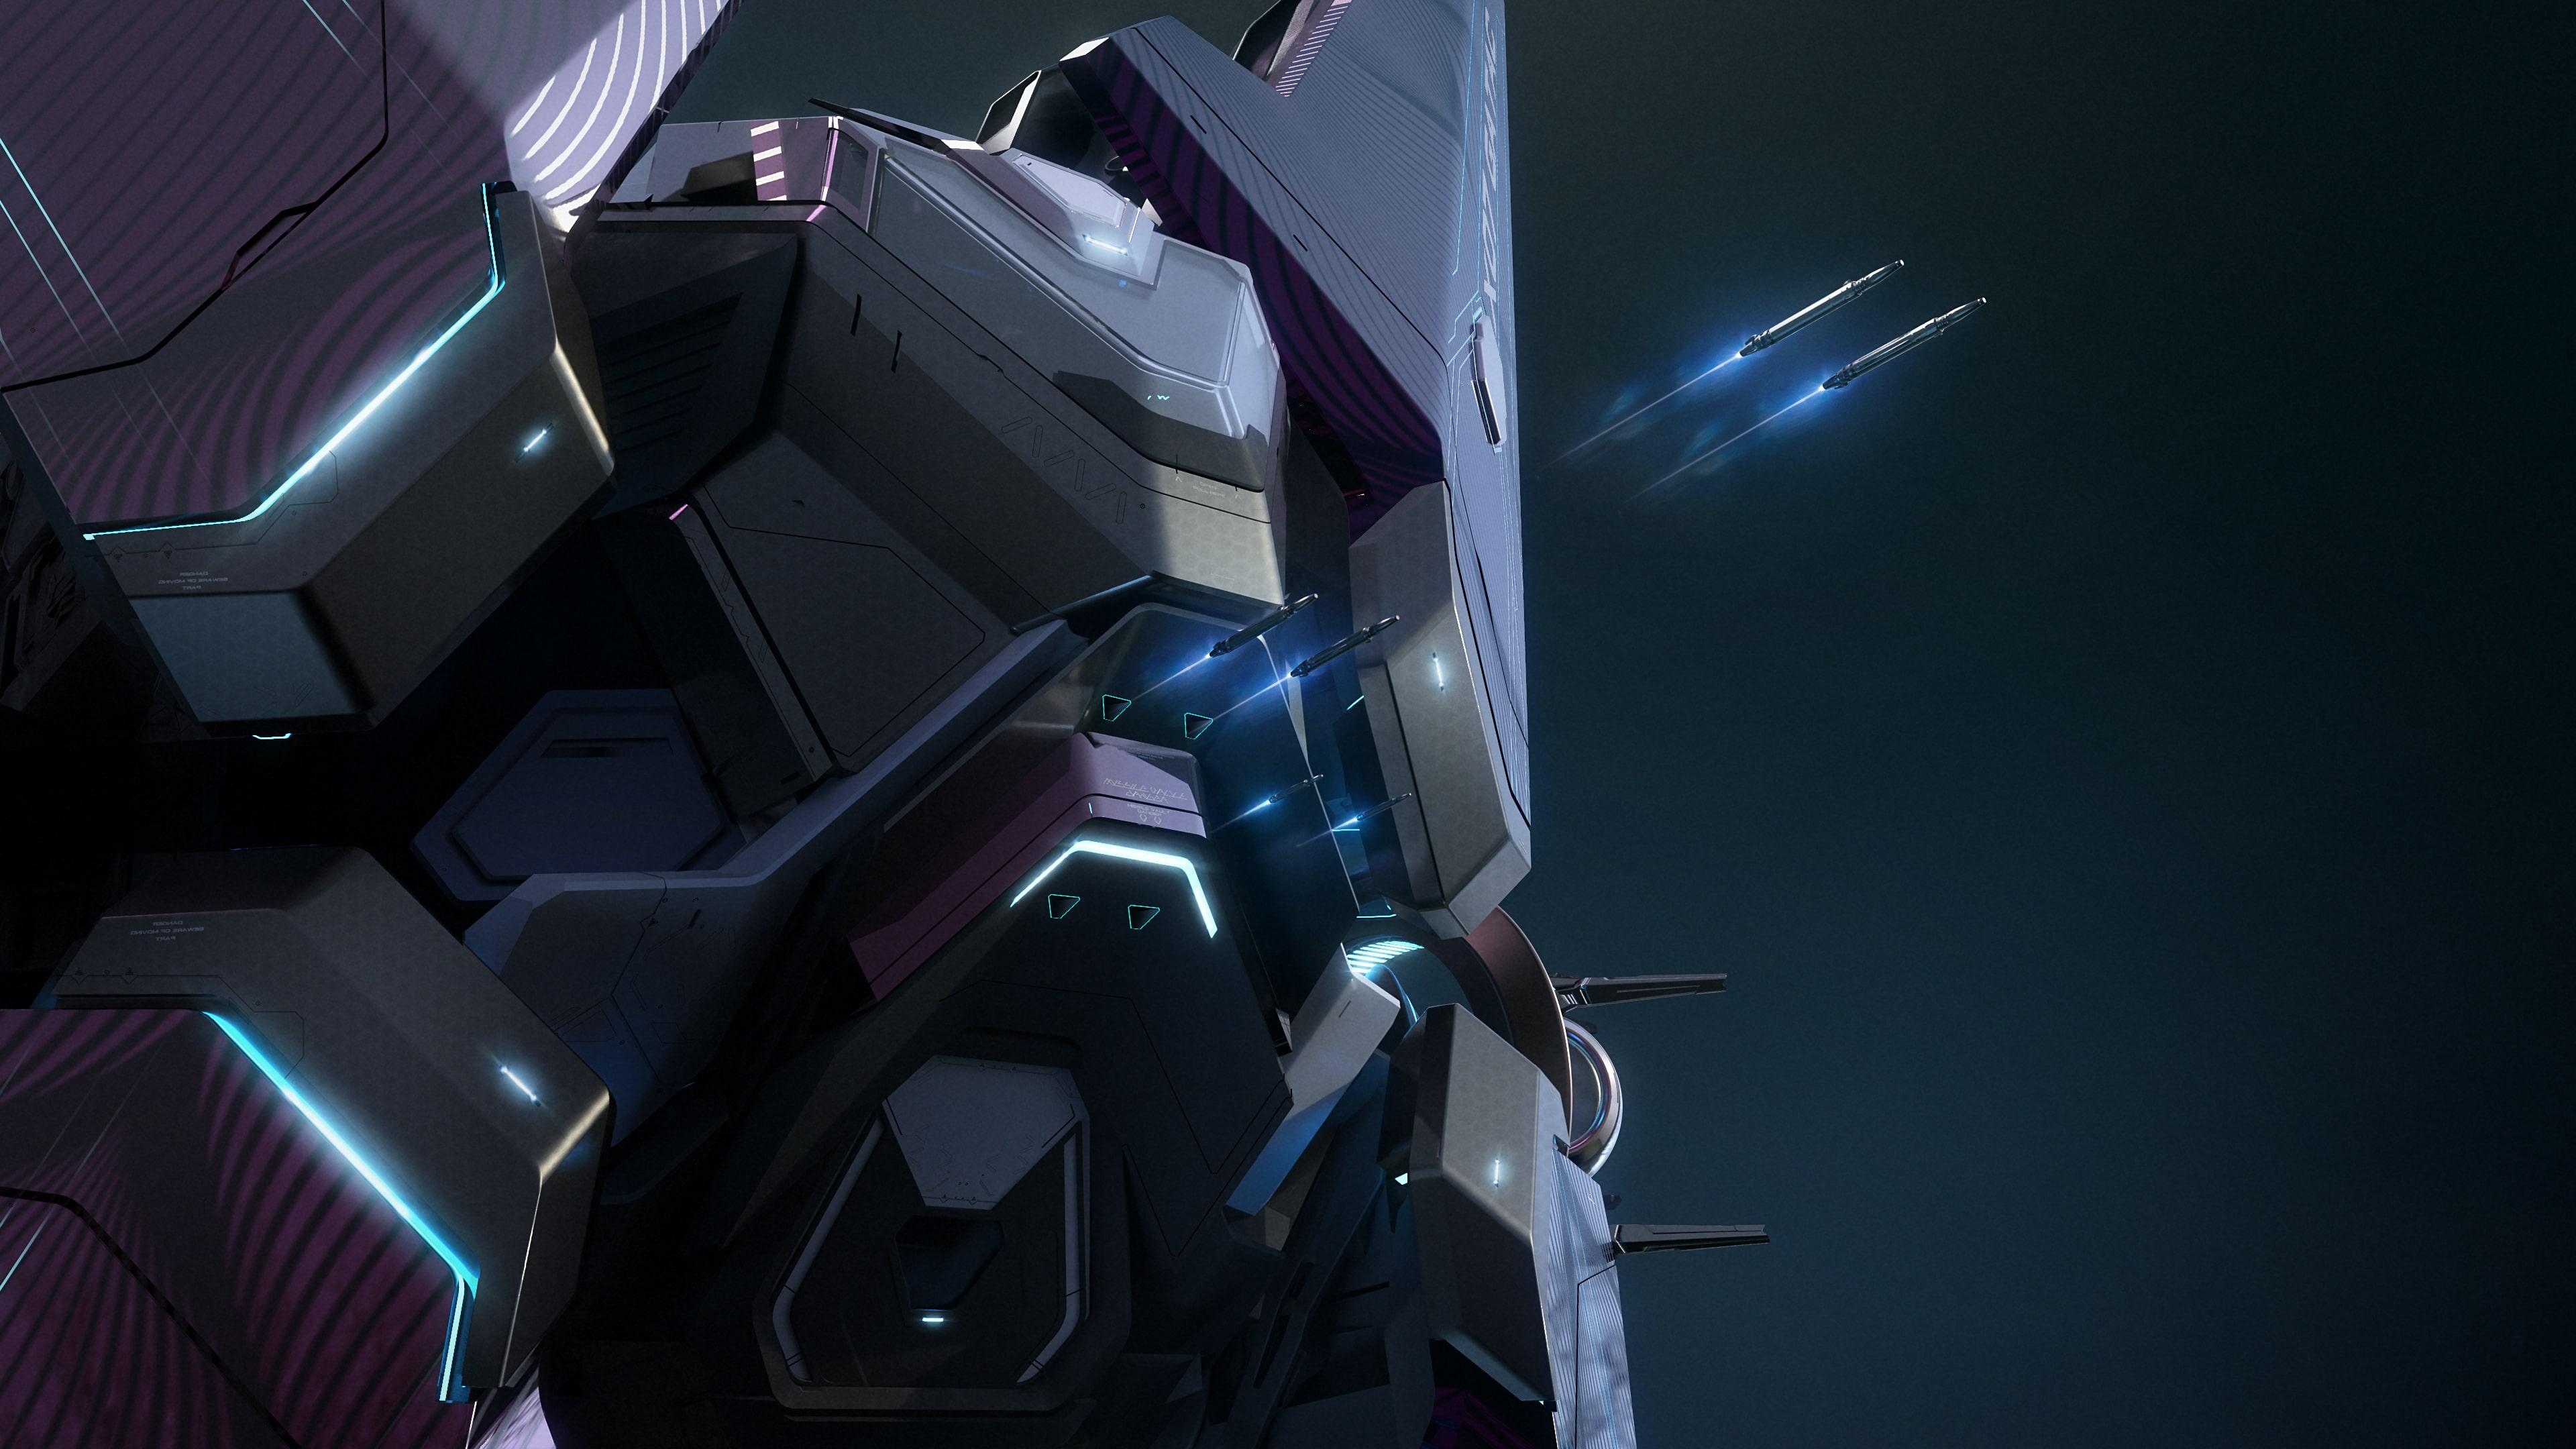 Xian_Cargo_Small_Promo_CU_Missiles_PJ01-Min